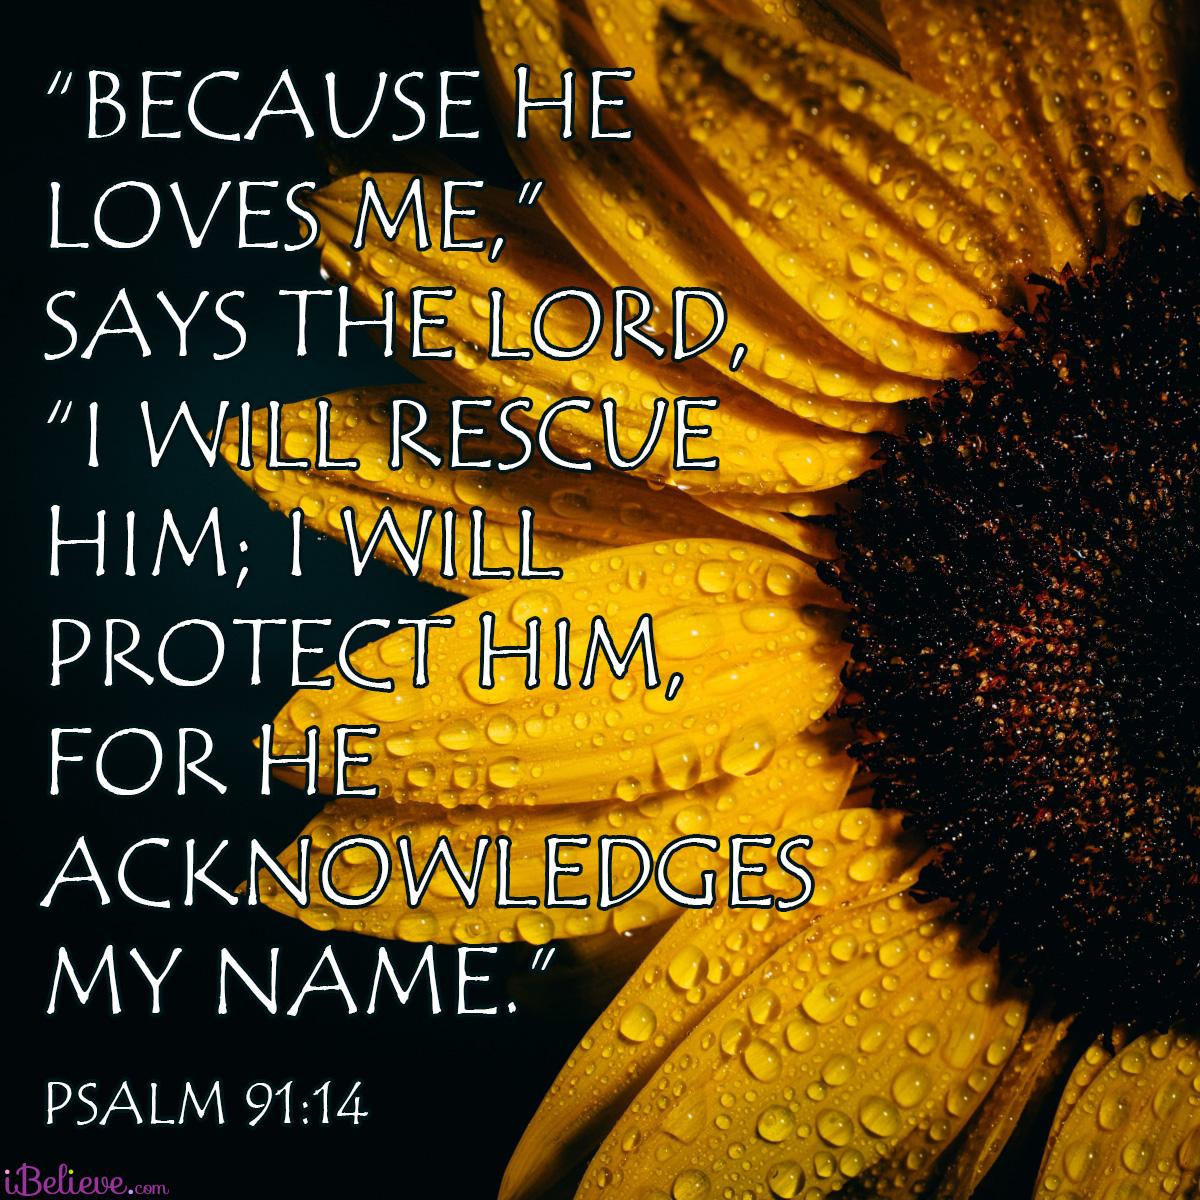 Psalm 91:14, inspirational image